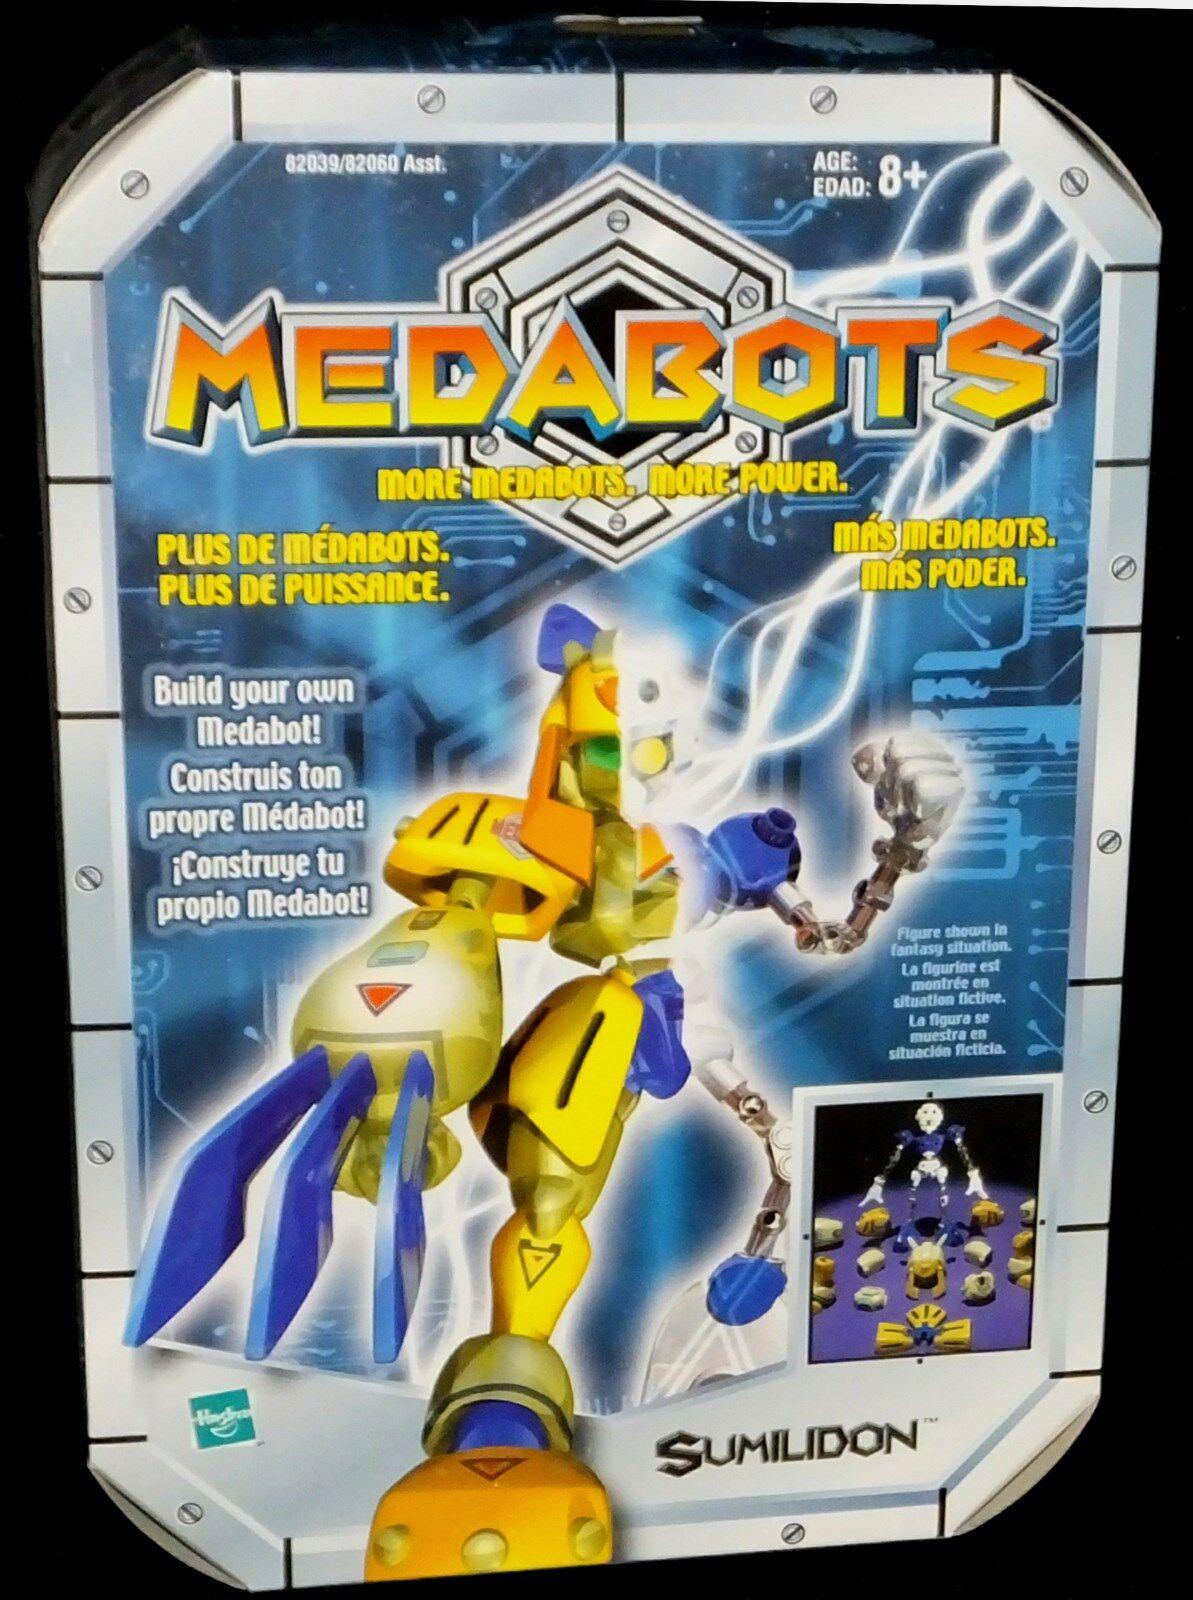 Medabots Build Your Own Kits 6  Sumilidon New Factory Sealed Hasbro Medared 1997